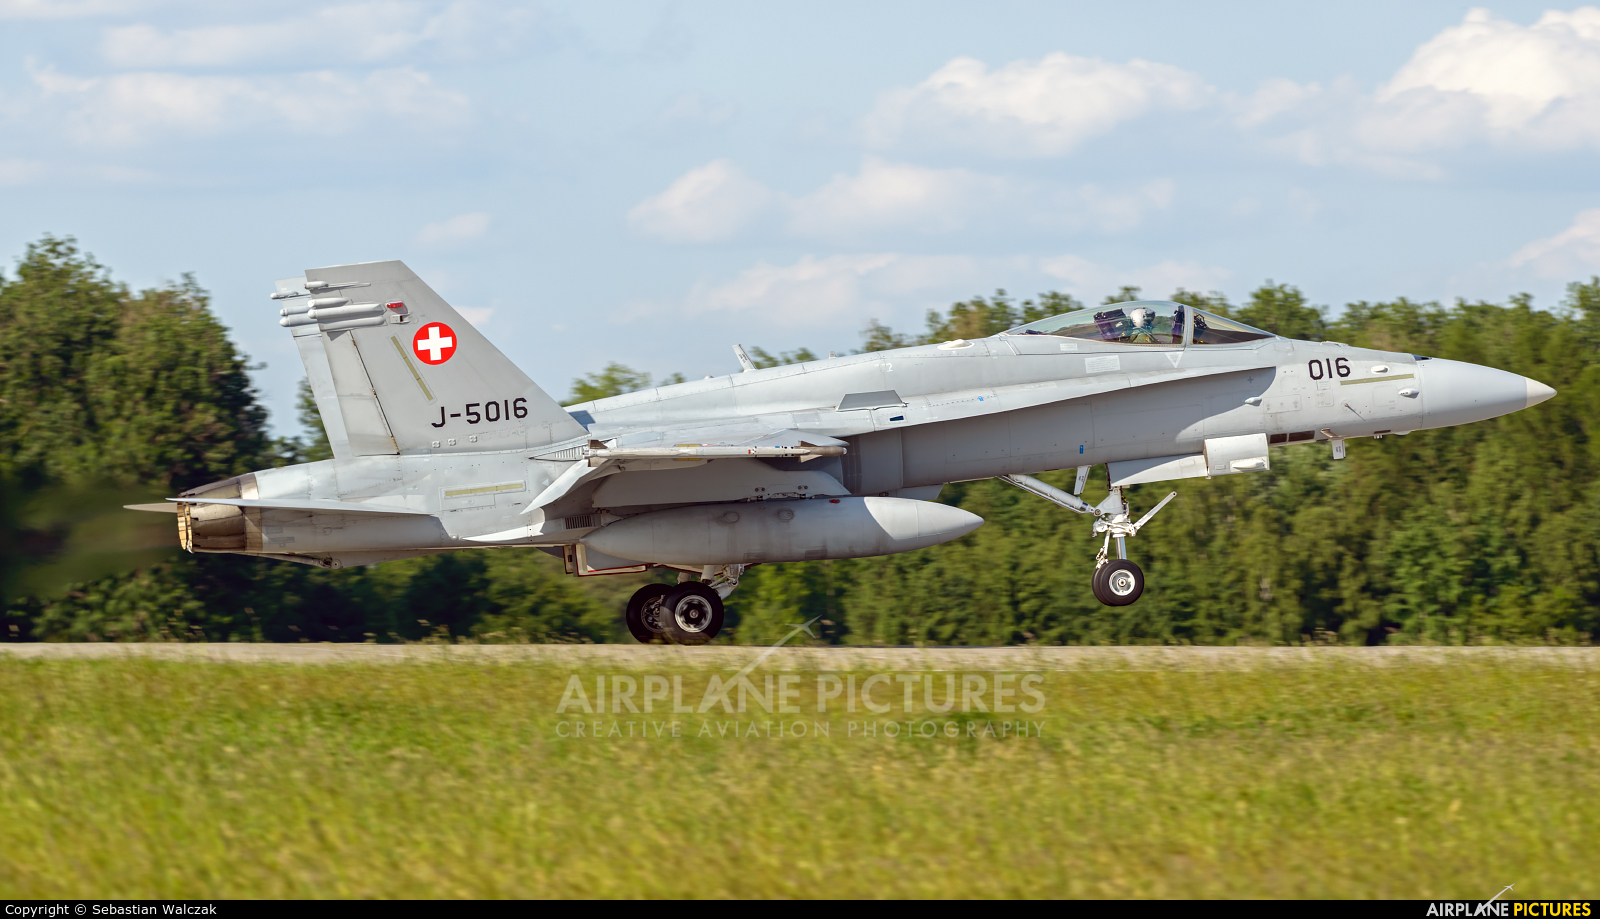 Switzerland - Air Force J-5016 aircraft at Poznań - Krzesiny